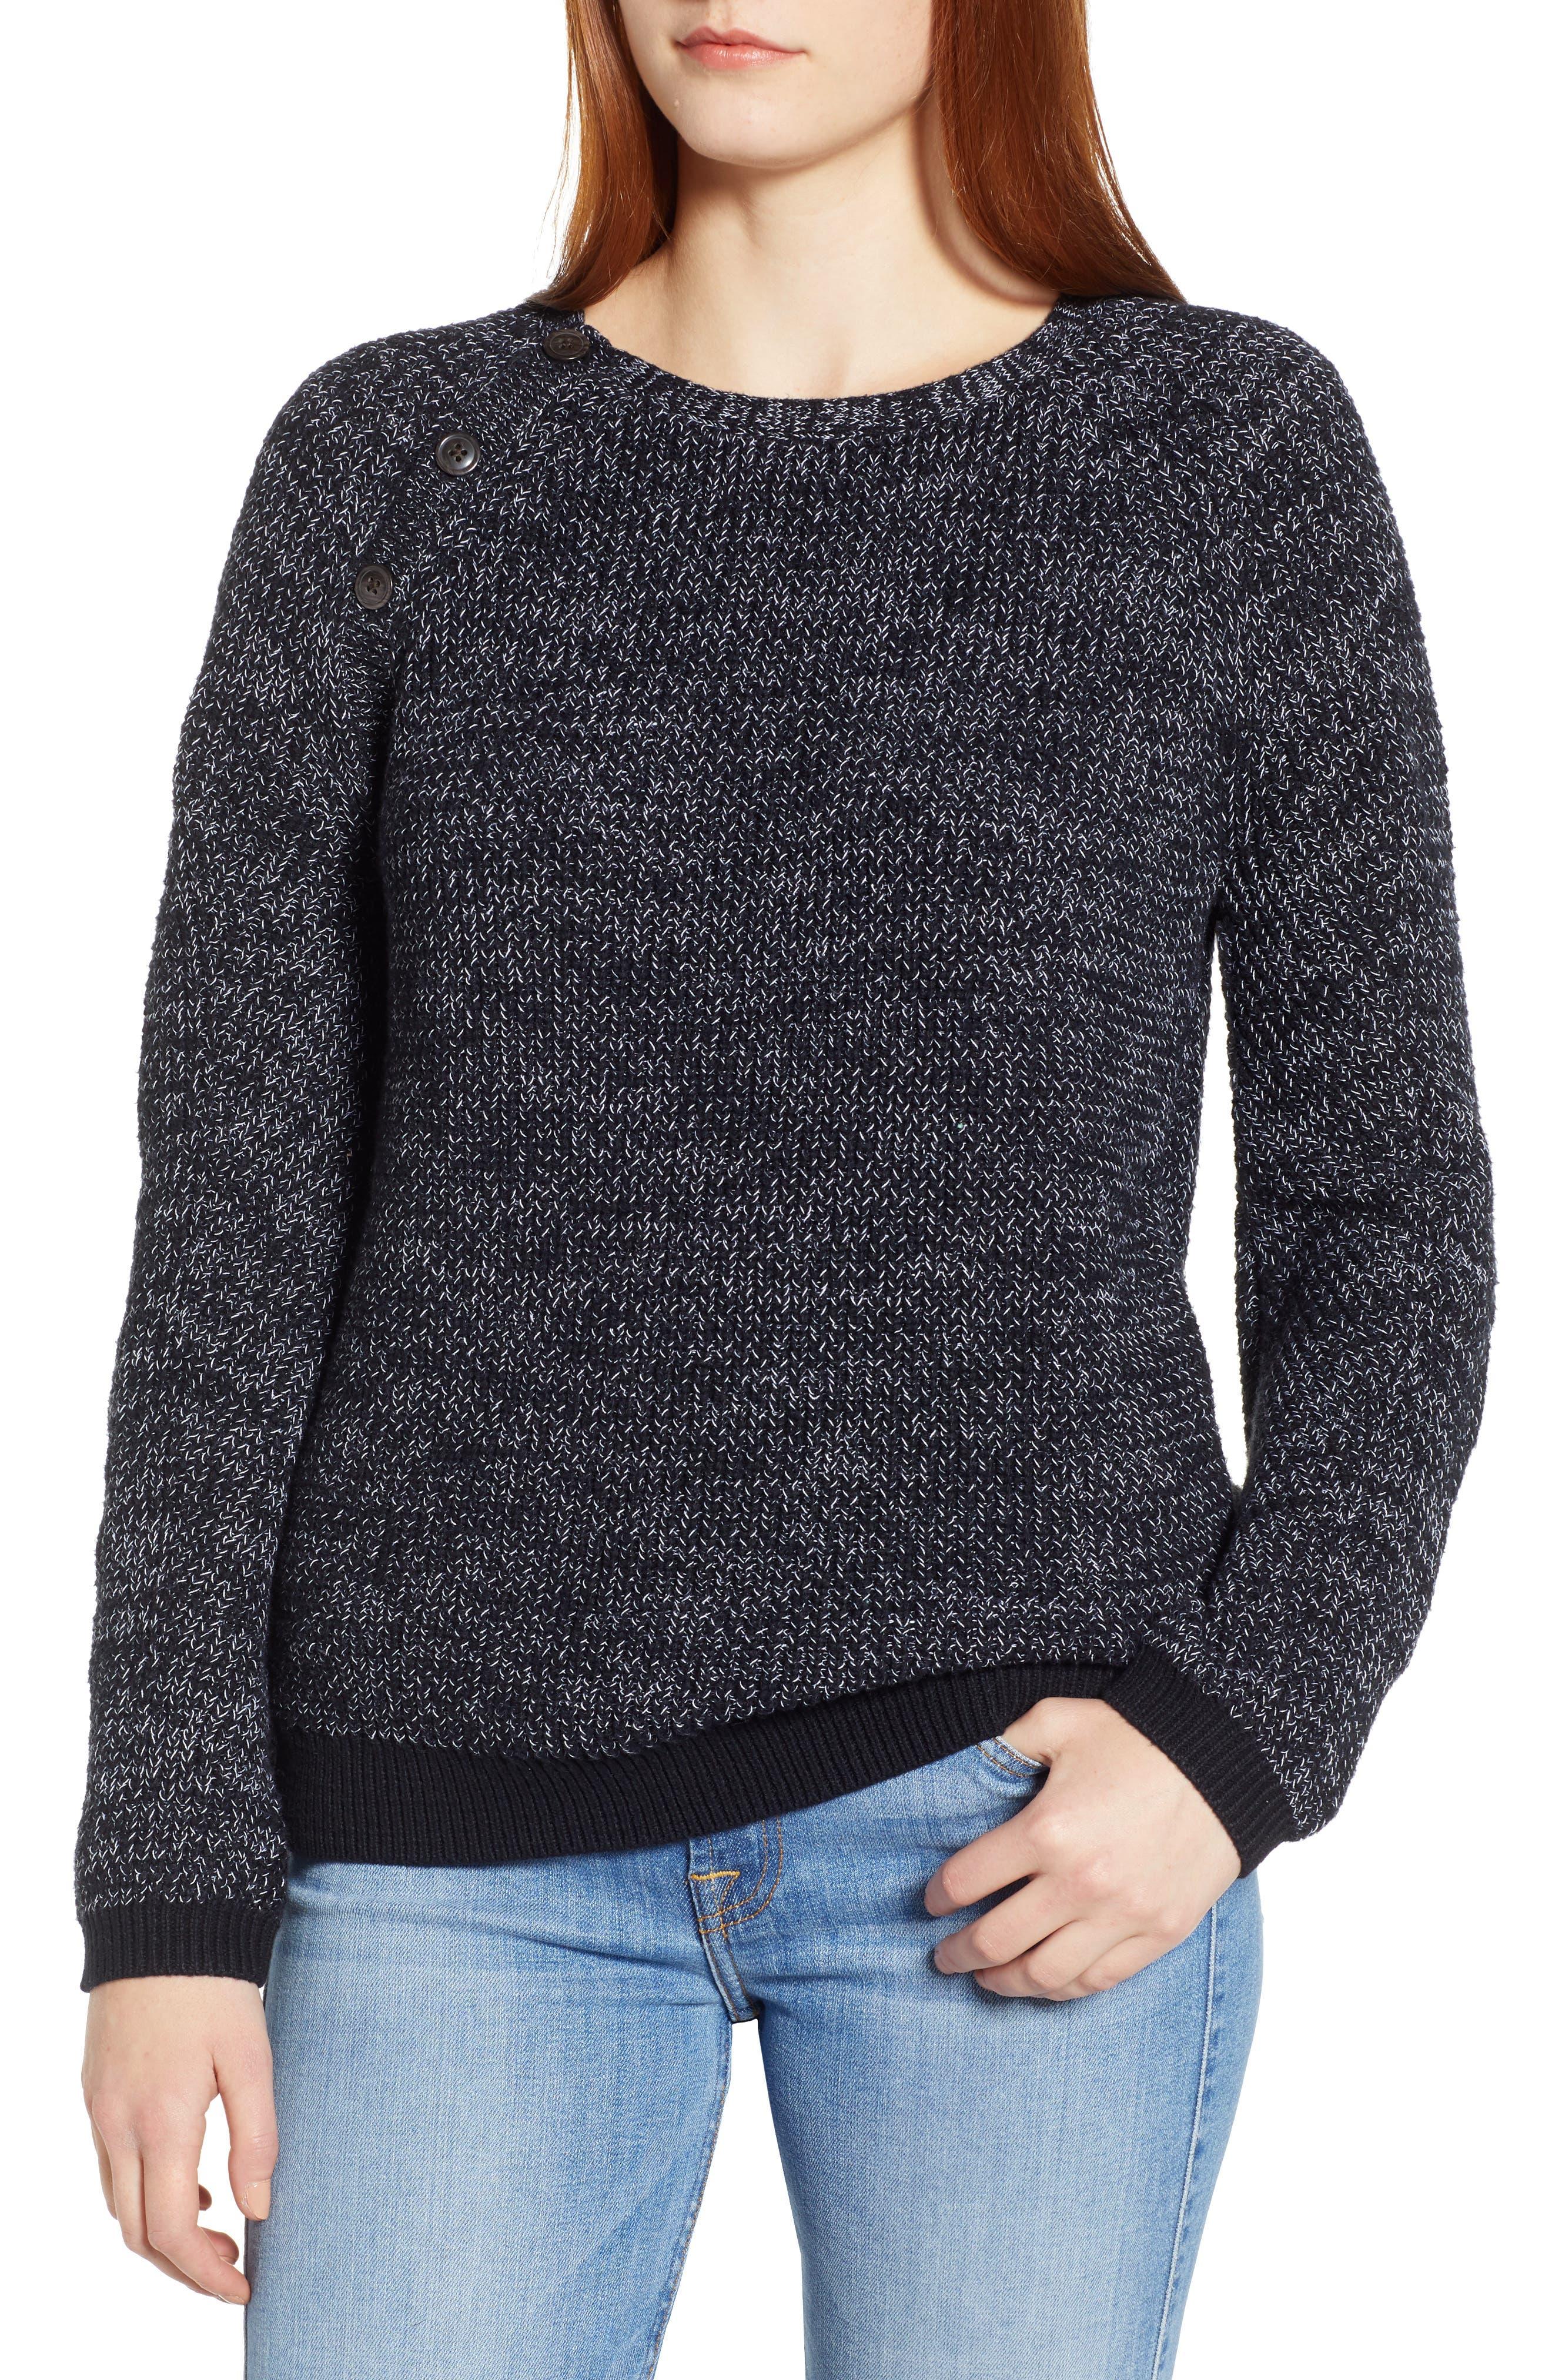 Raglan Sleeve Sweater,                             Main thumbnail 1, color,                             BLACK CREW MARL